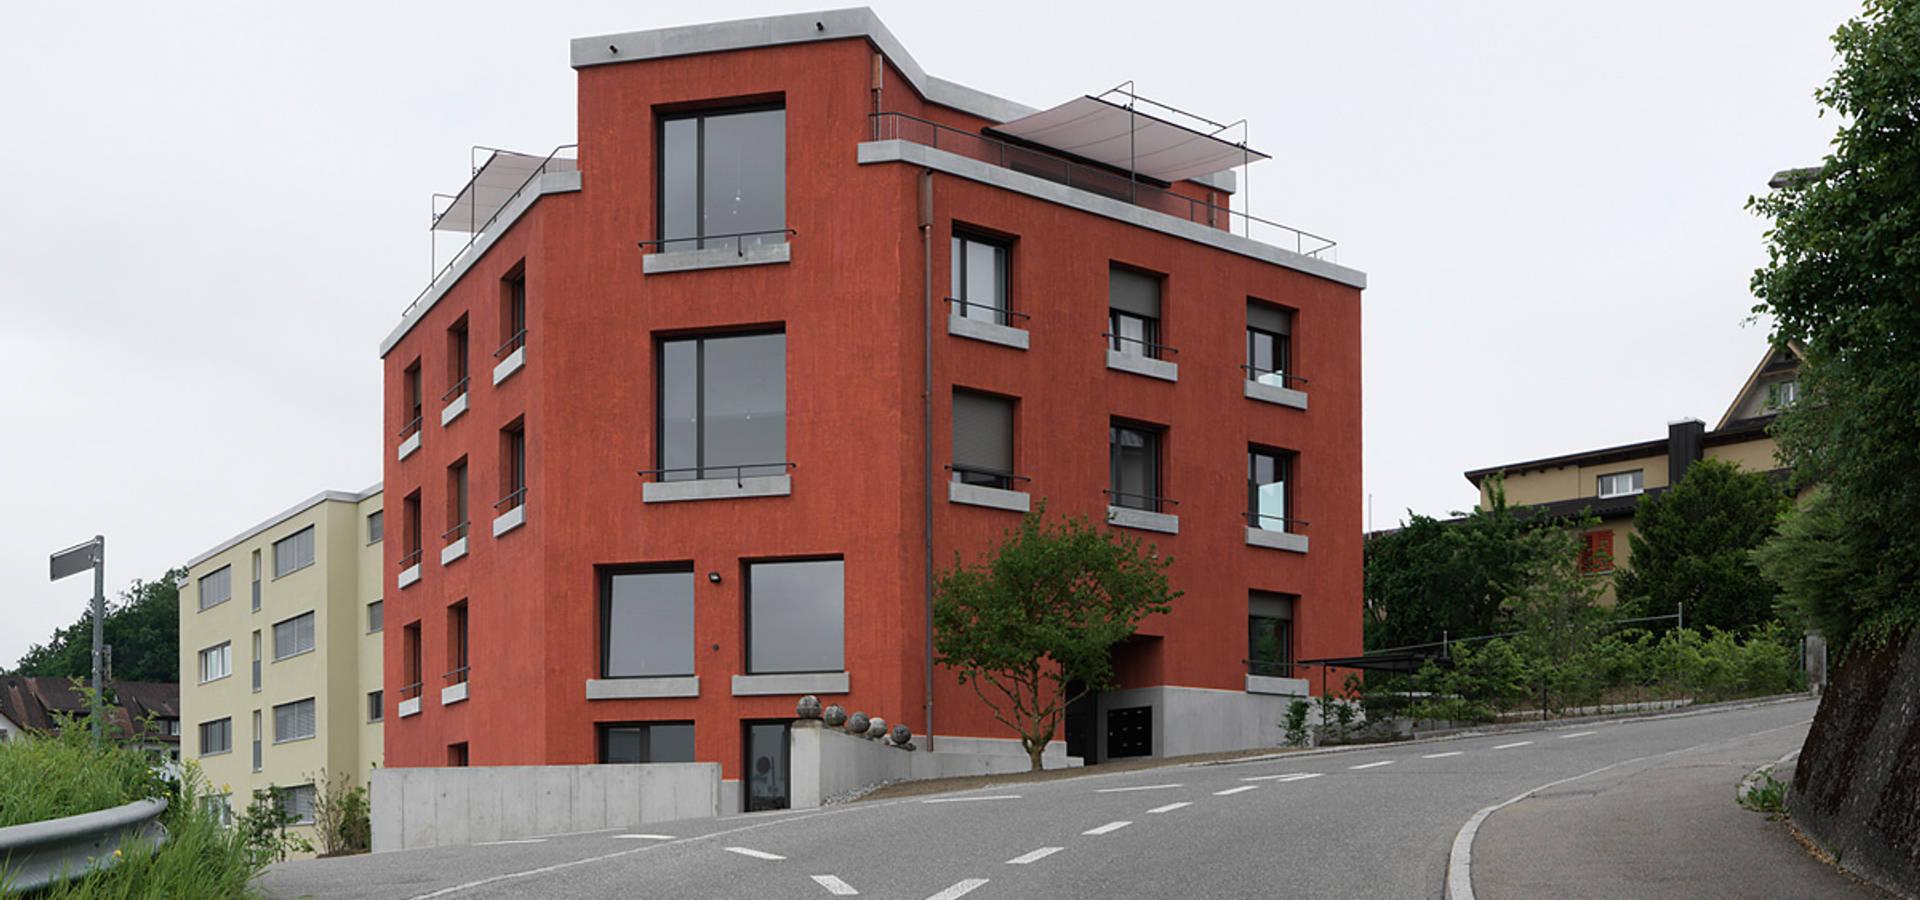 JOM Architekten